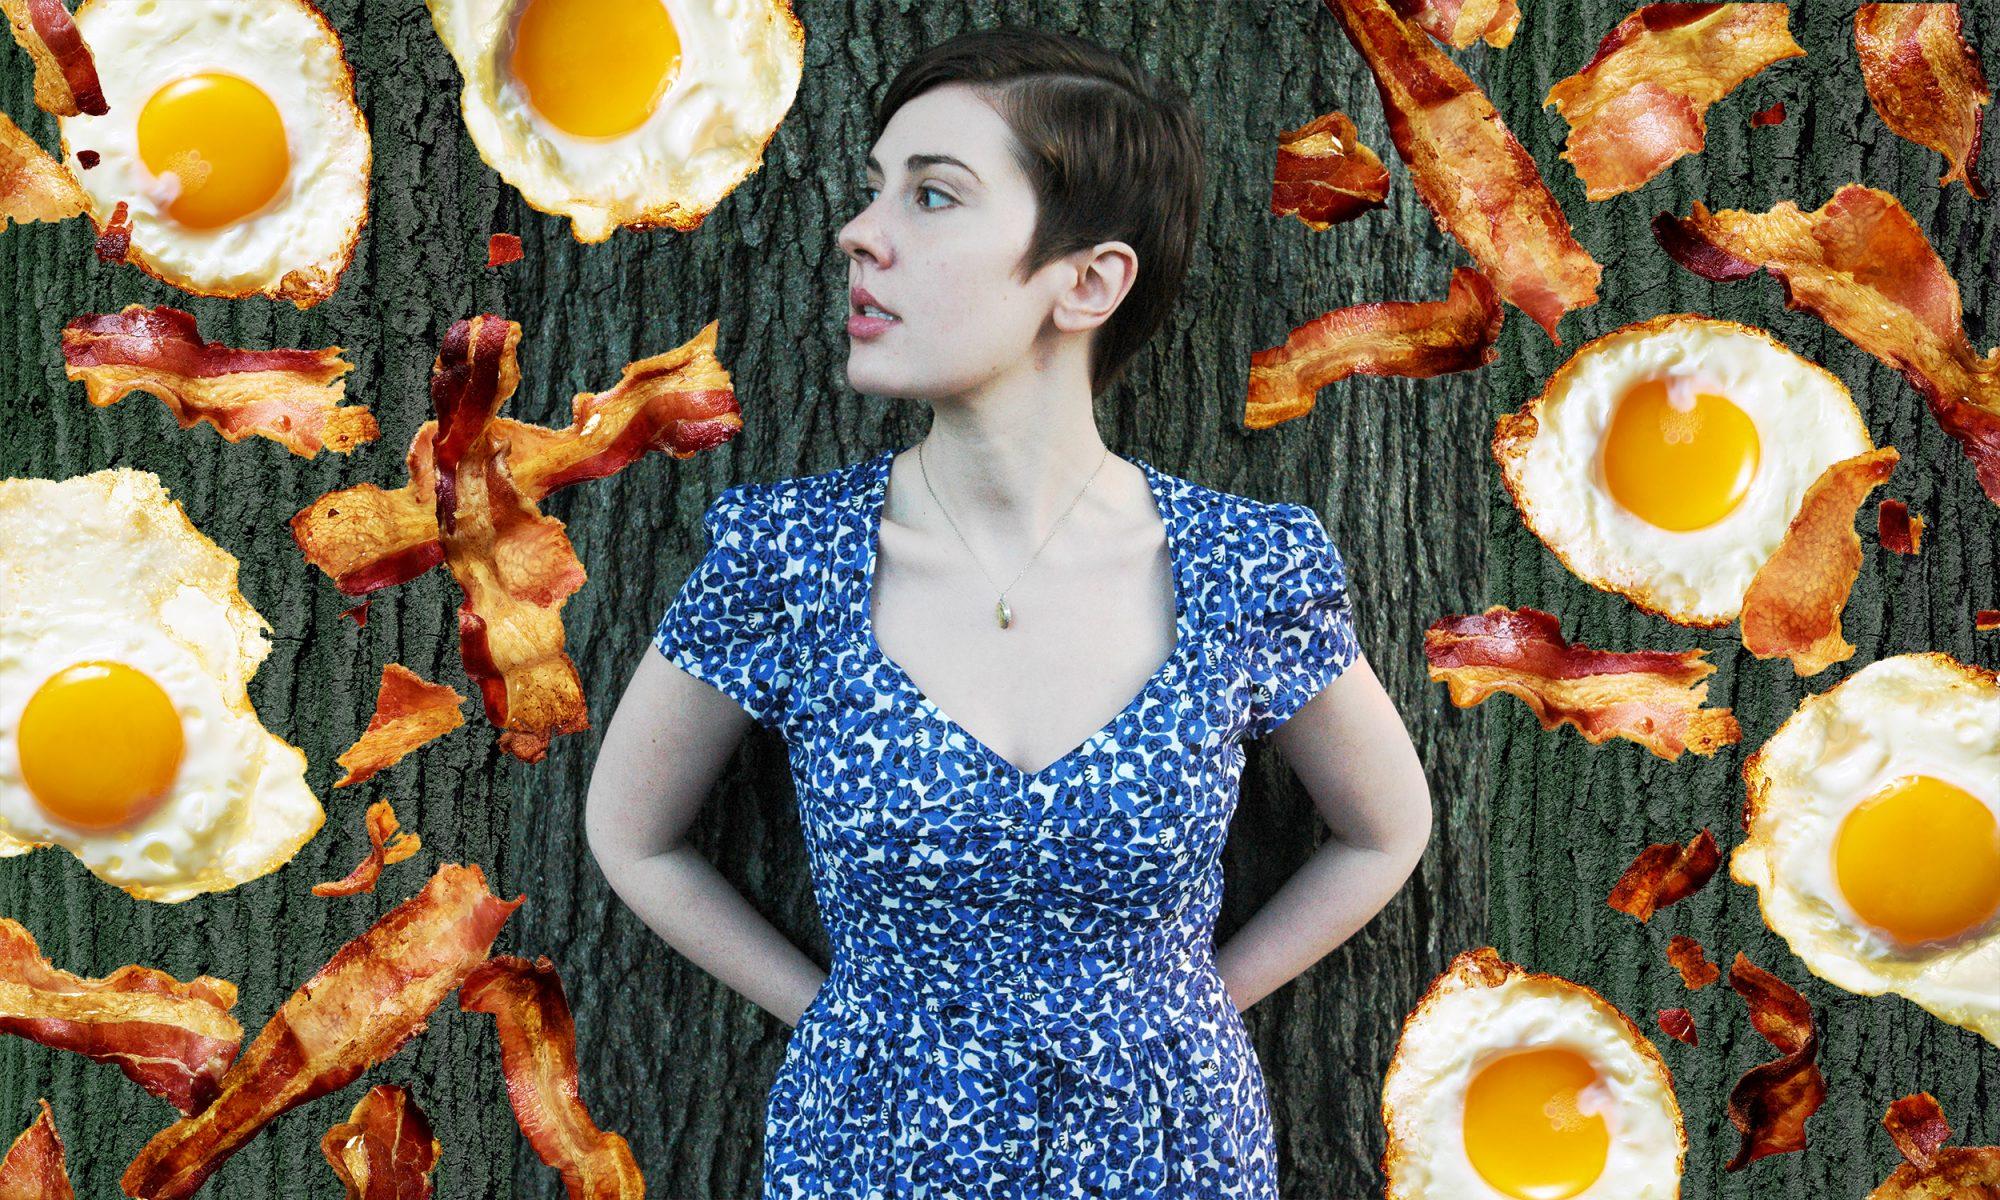 EC: How Patricia Lockwood Does Breakfast